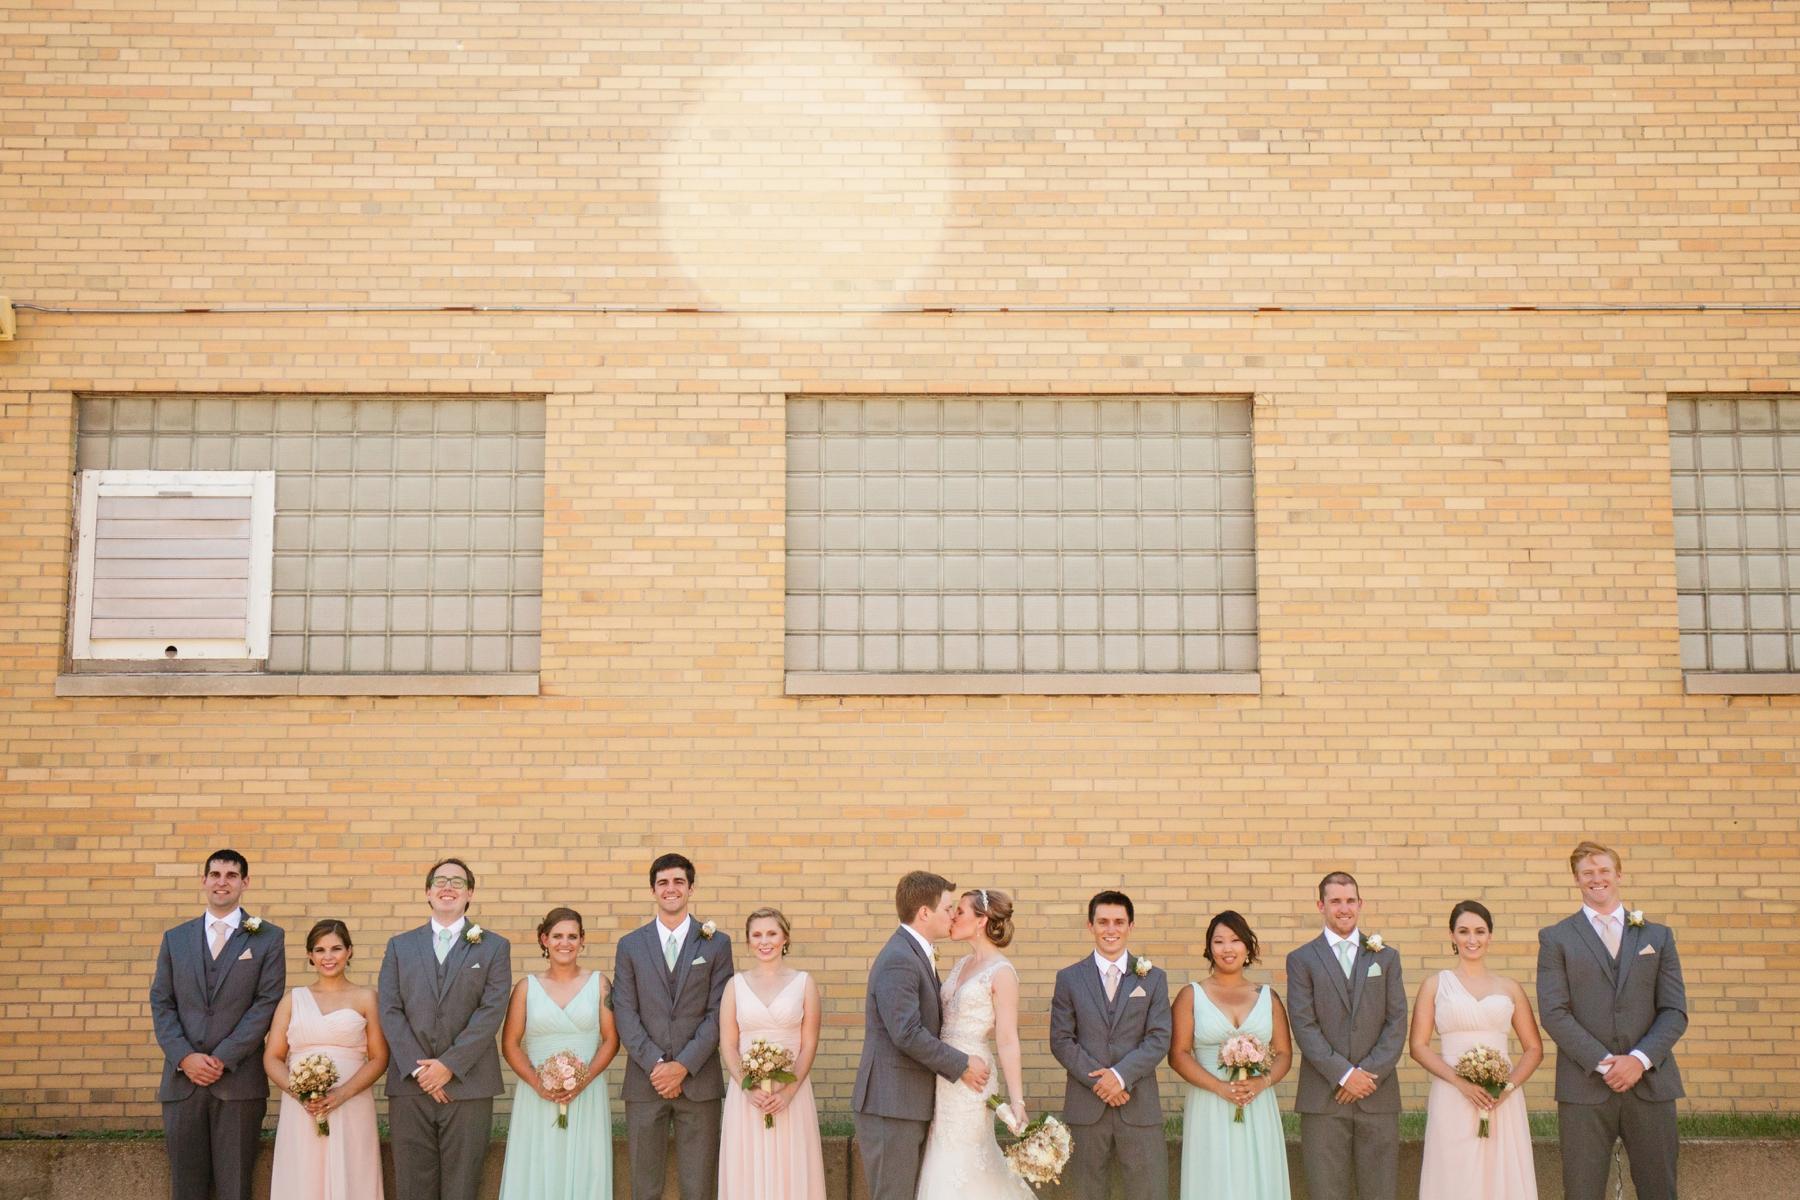 Ben_Jillian_Midland_Baycity_Wedding_0063.jpg